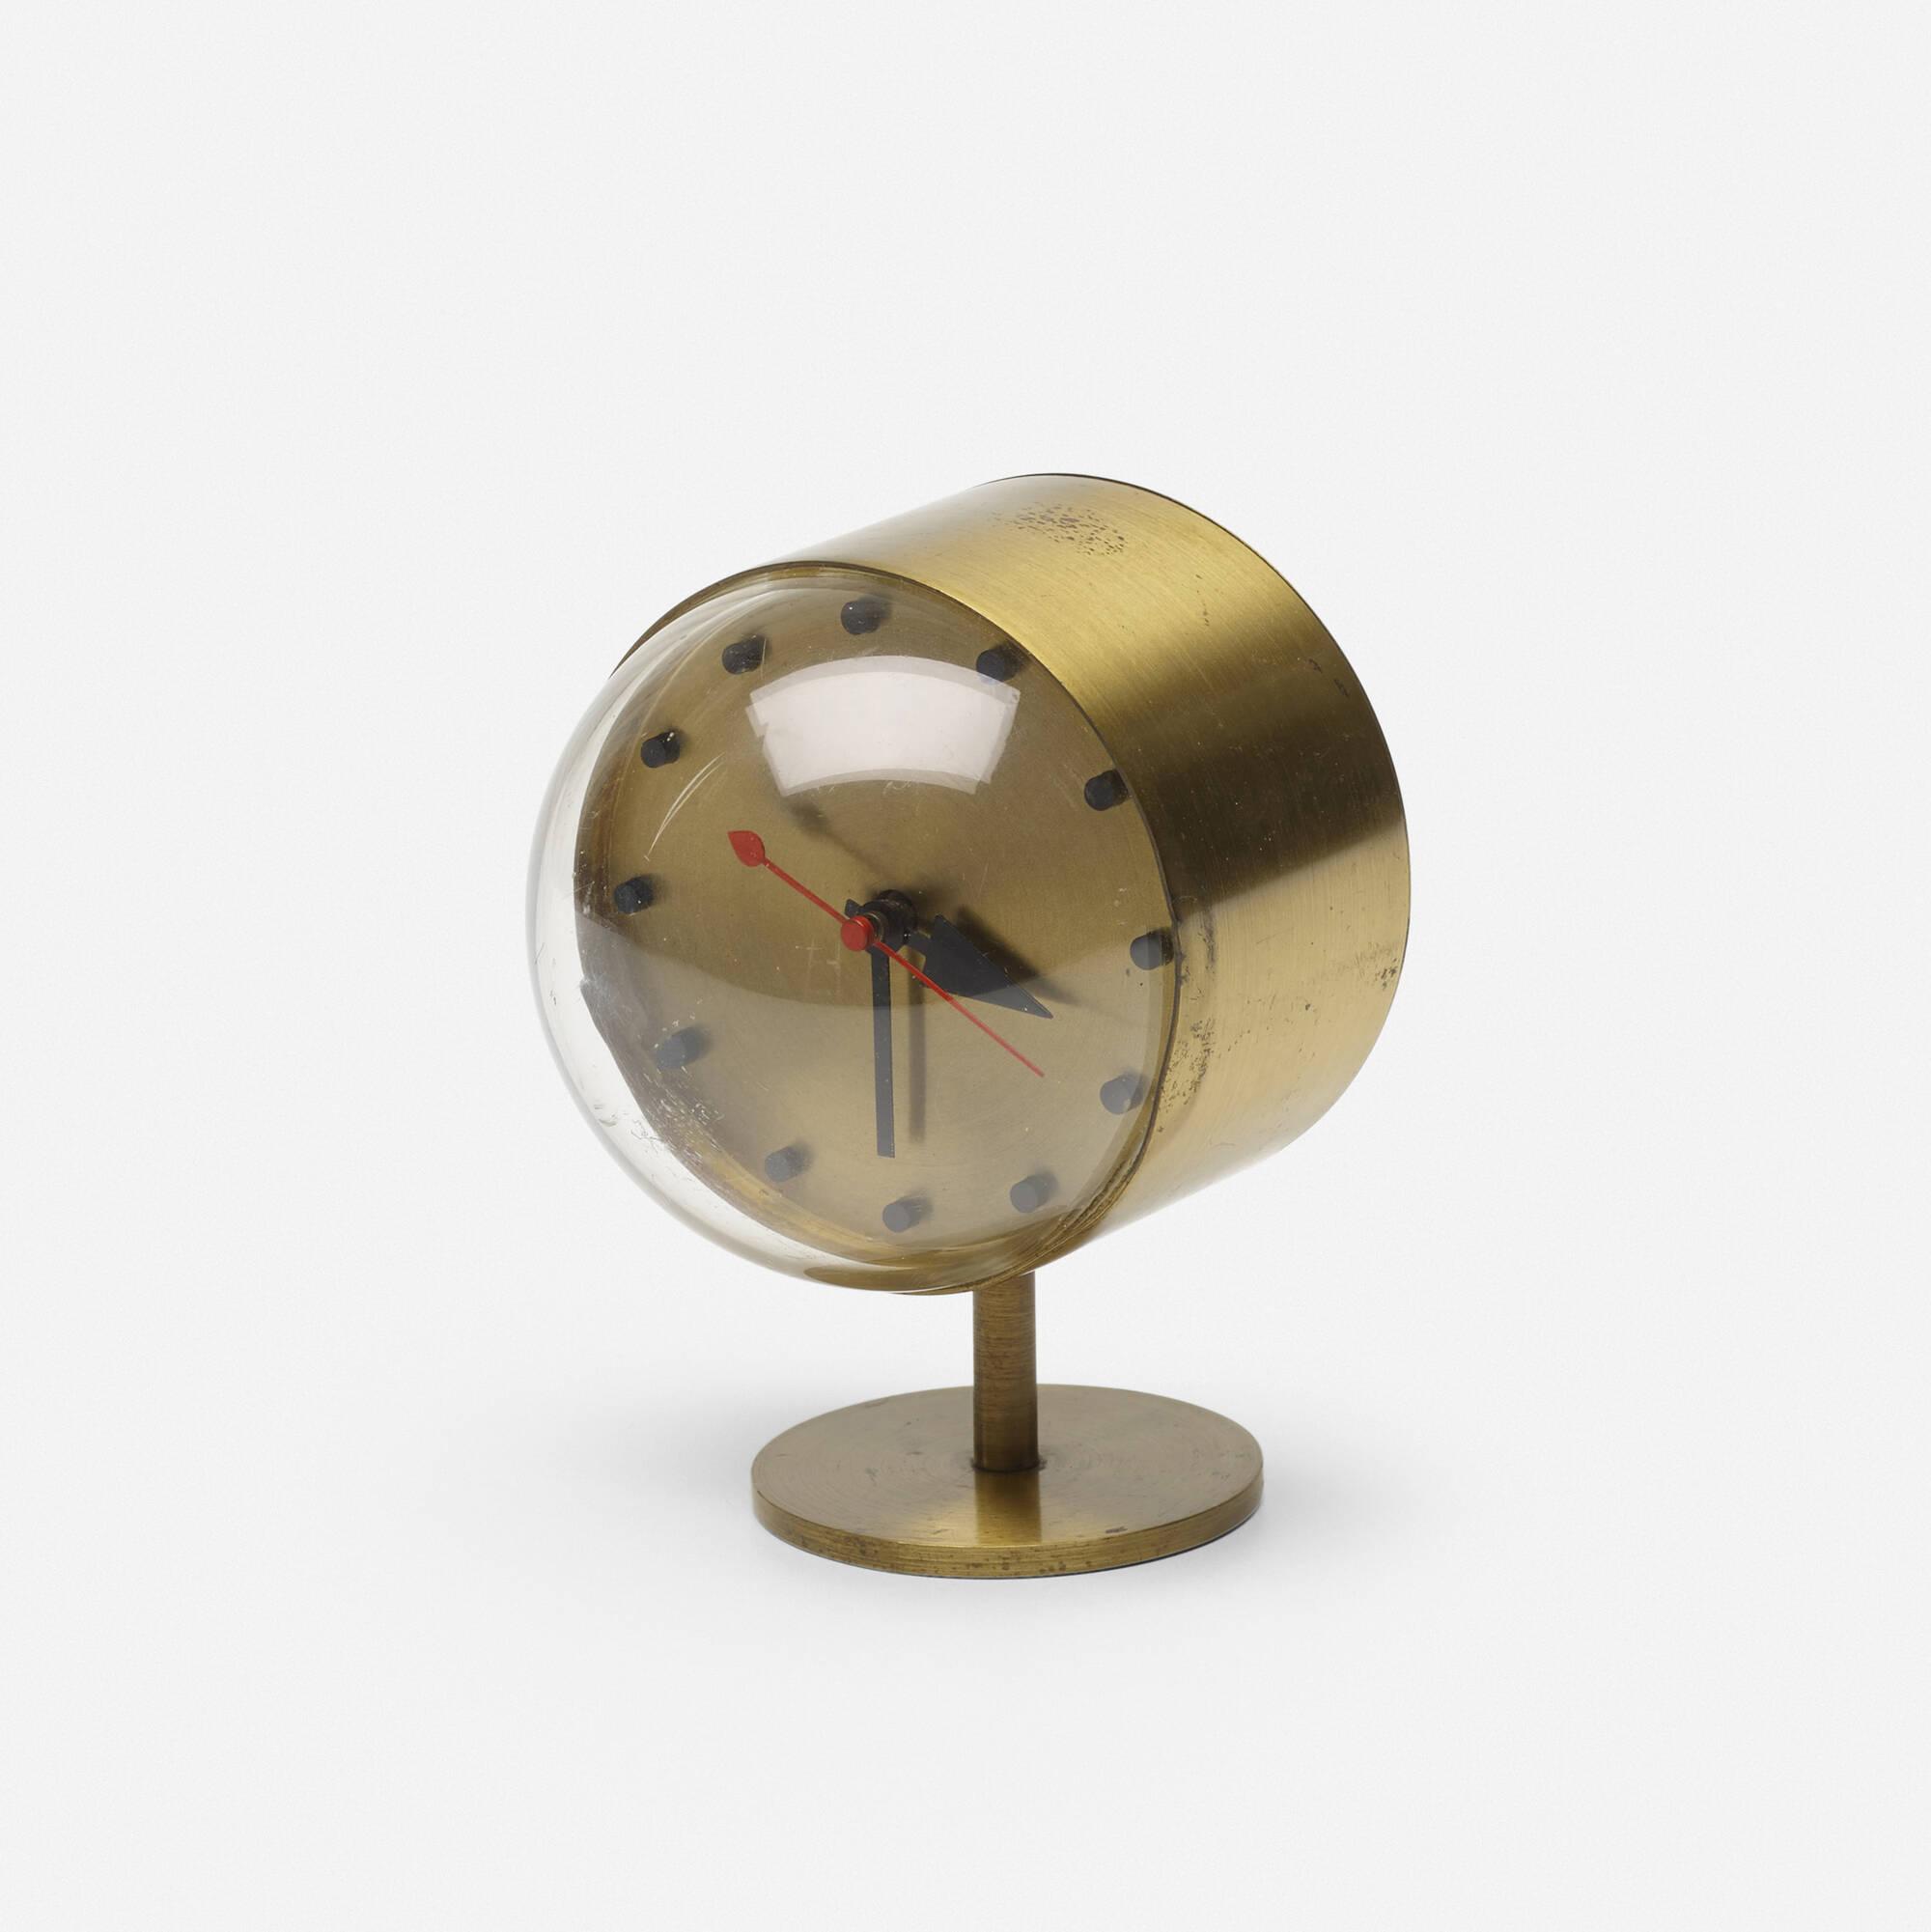 635: George Nelson & Associates / table clock, model 4766 (1 of 2)